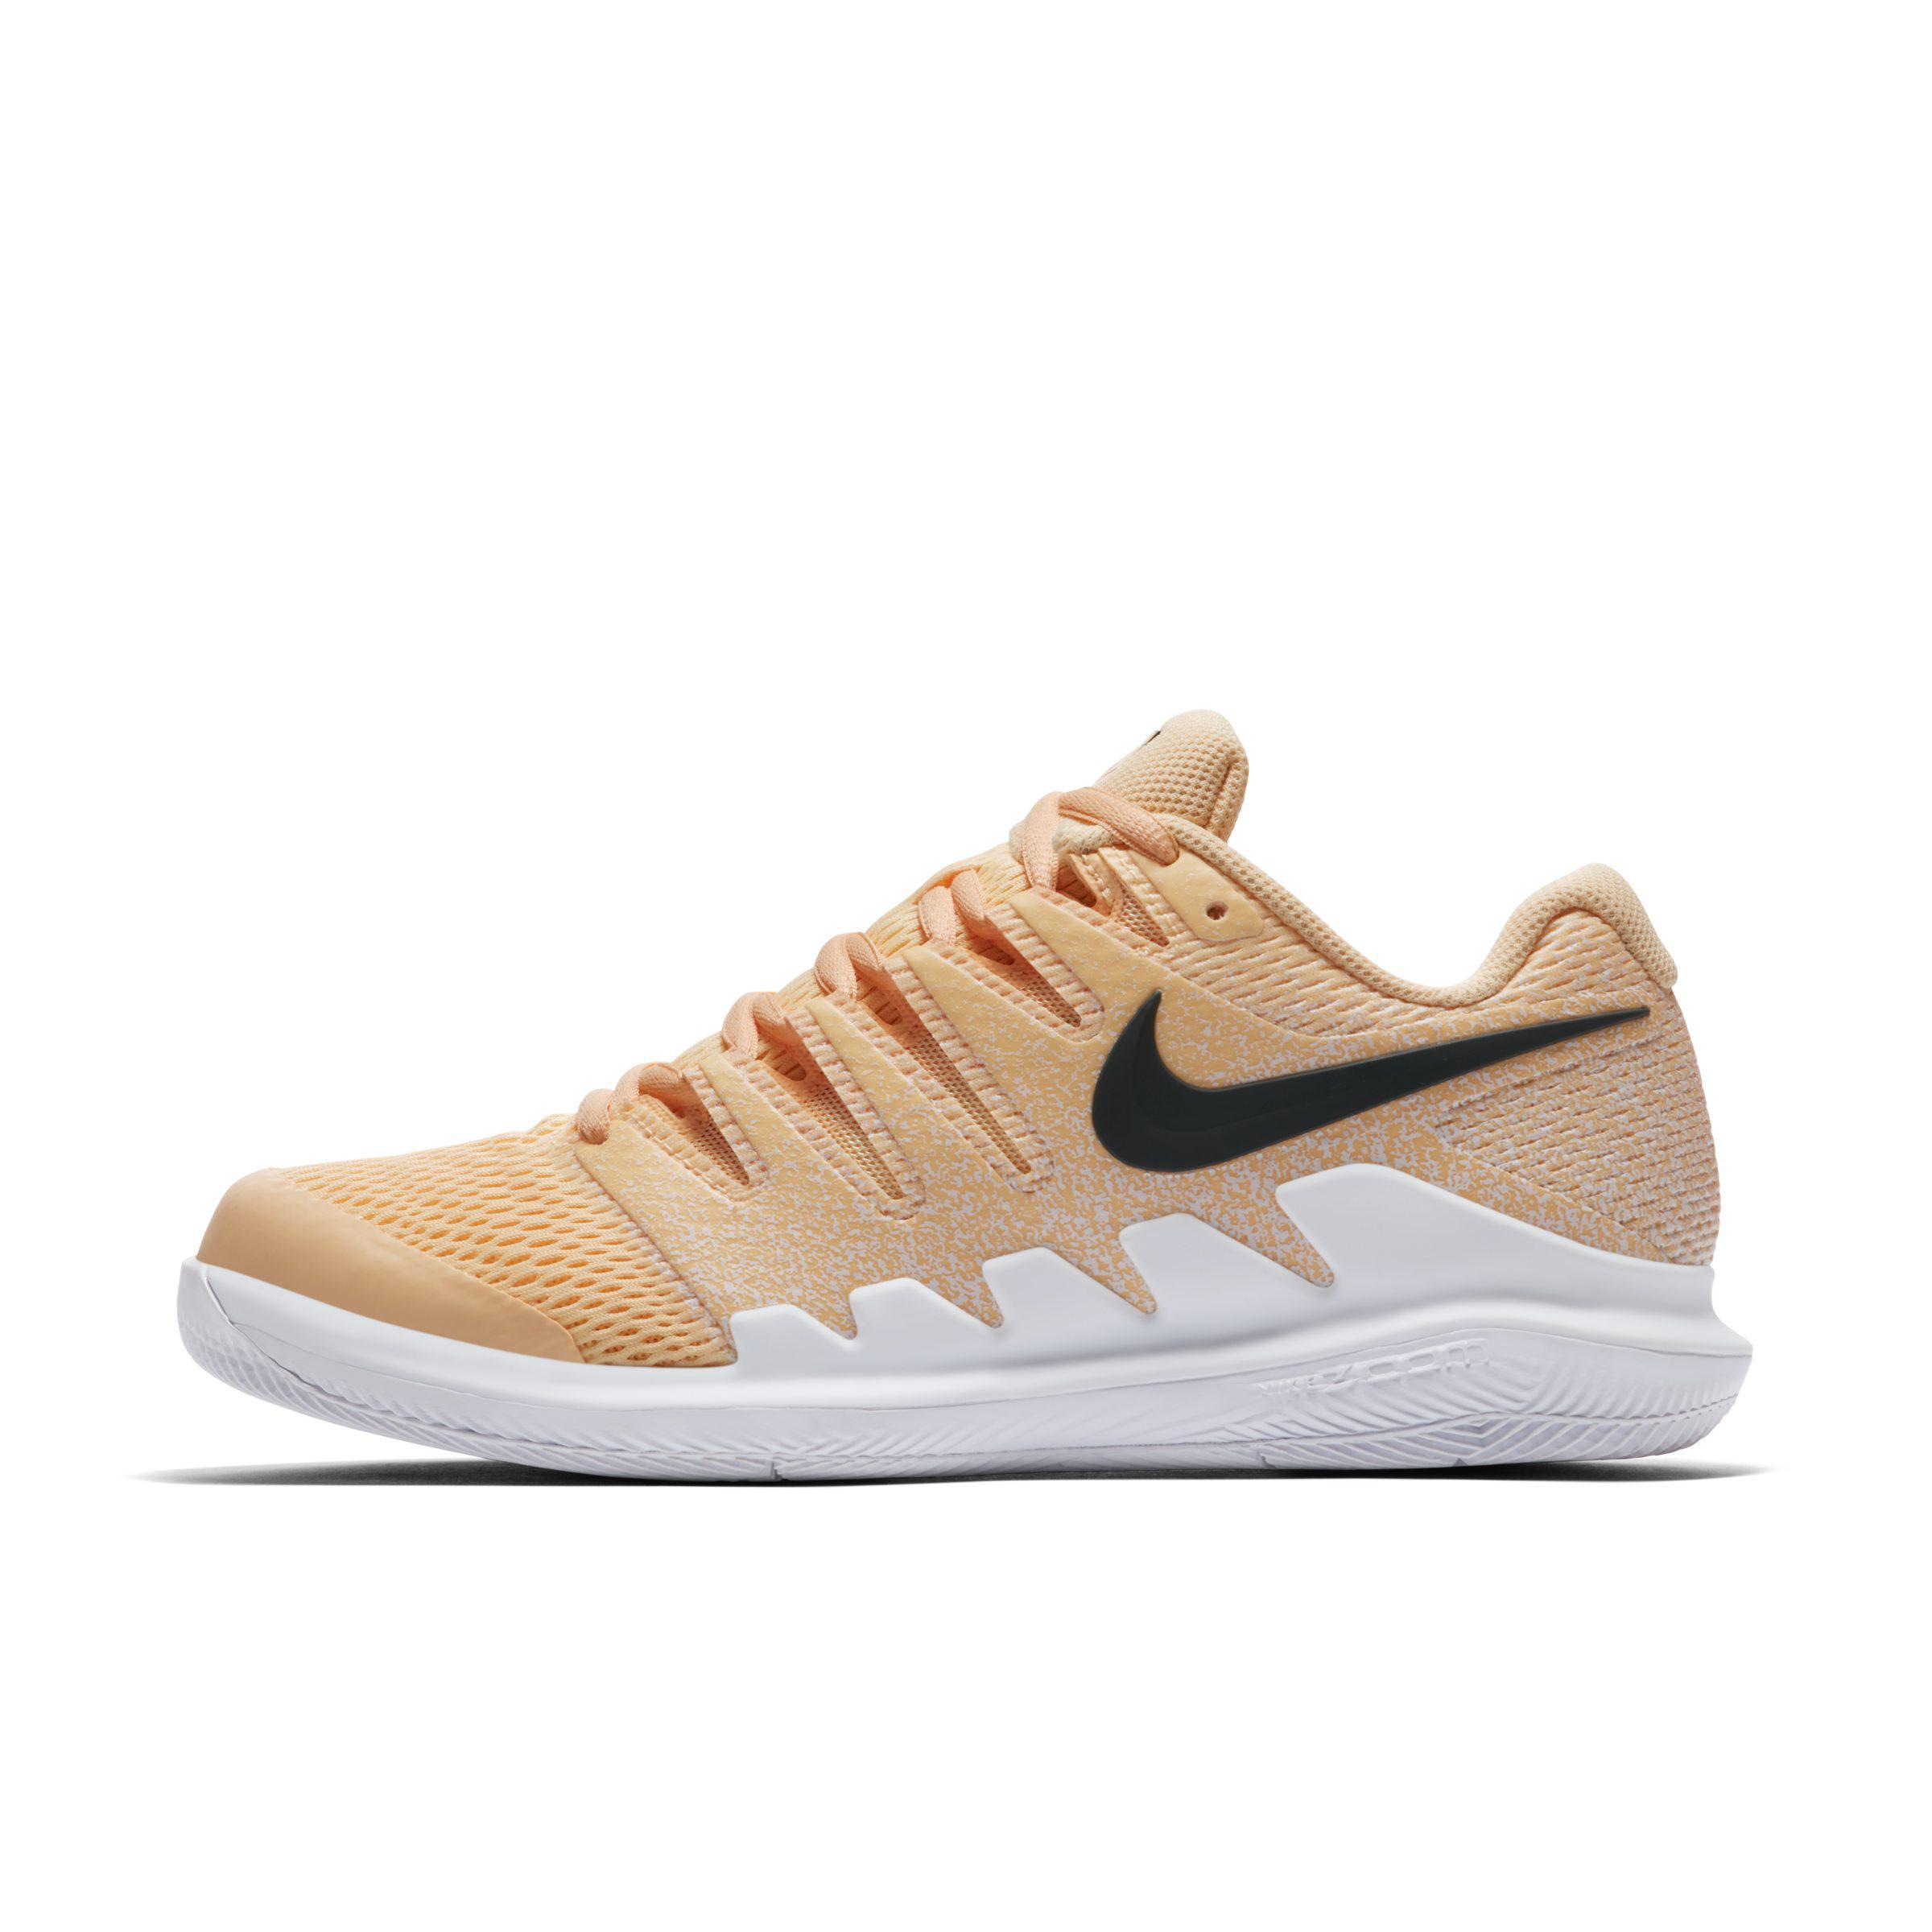 Nike Court Air Zoom Vapor X Hard Court Tennis Shoe in Orange - Lyst 196aa4046